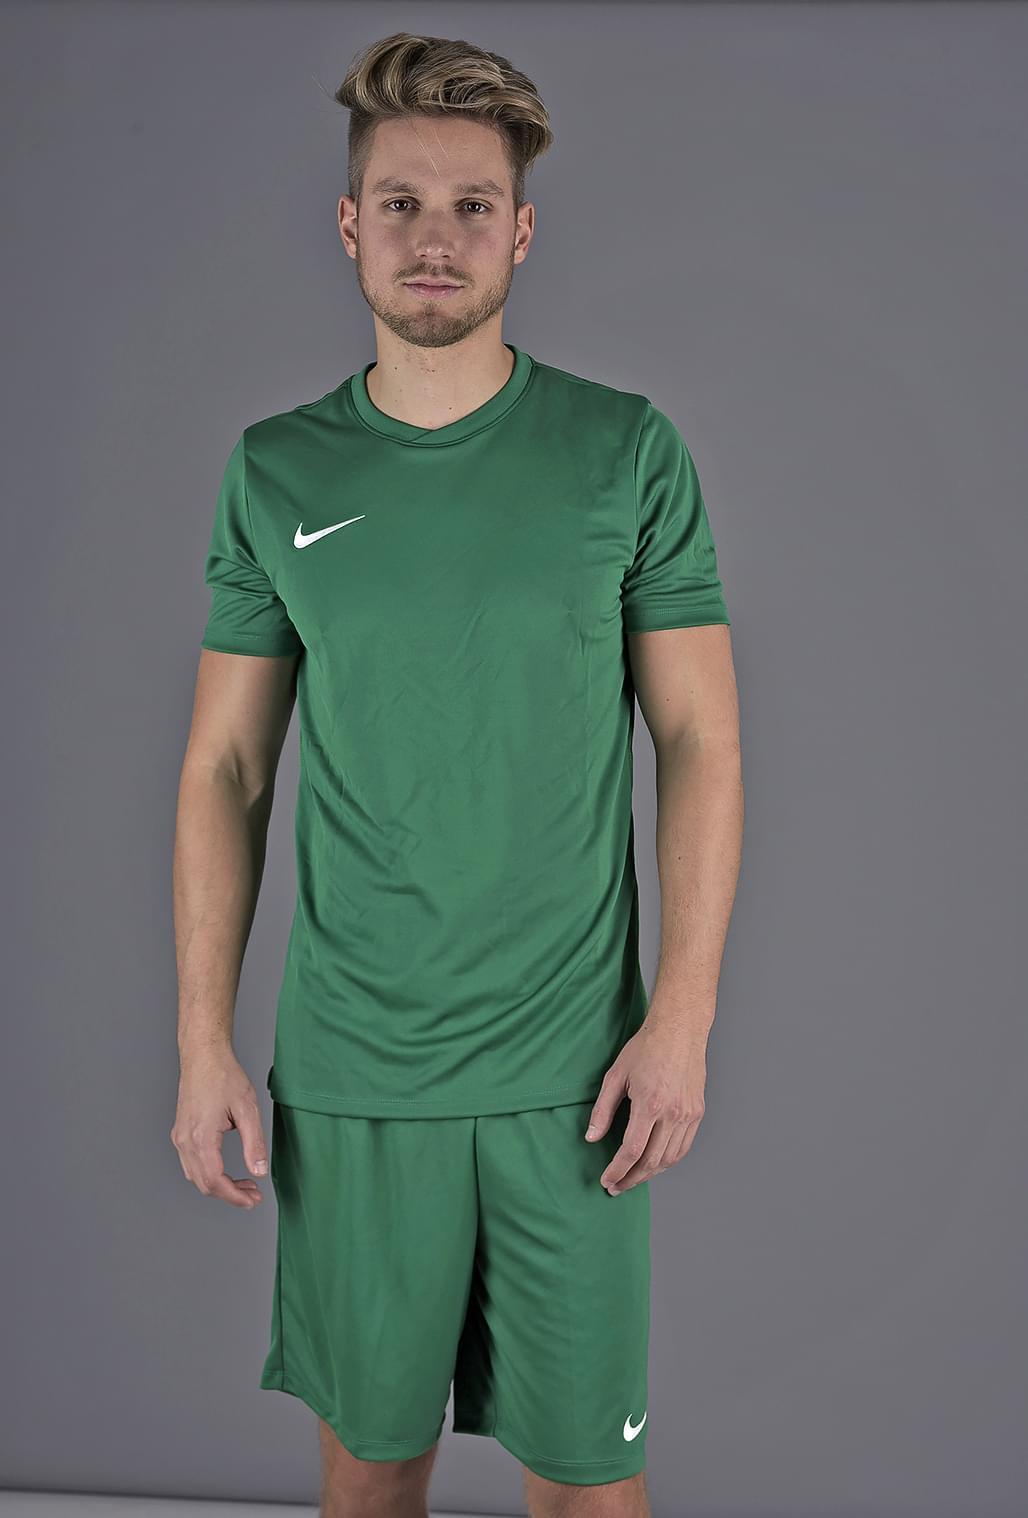 7a268270f528 Sportfactory | férfi focimez | Sportfactory.hu